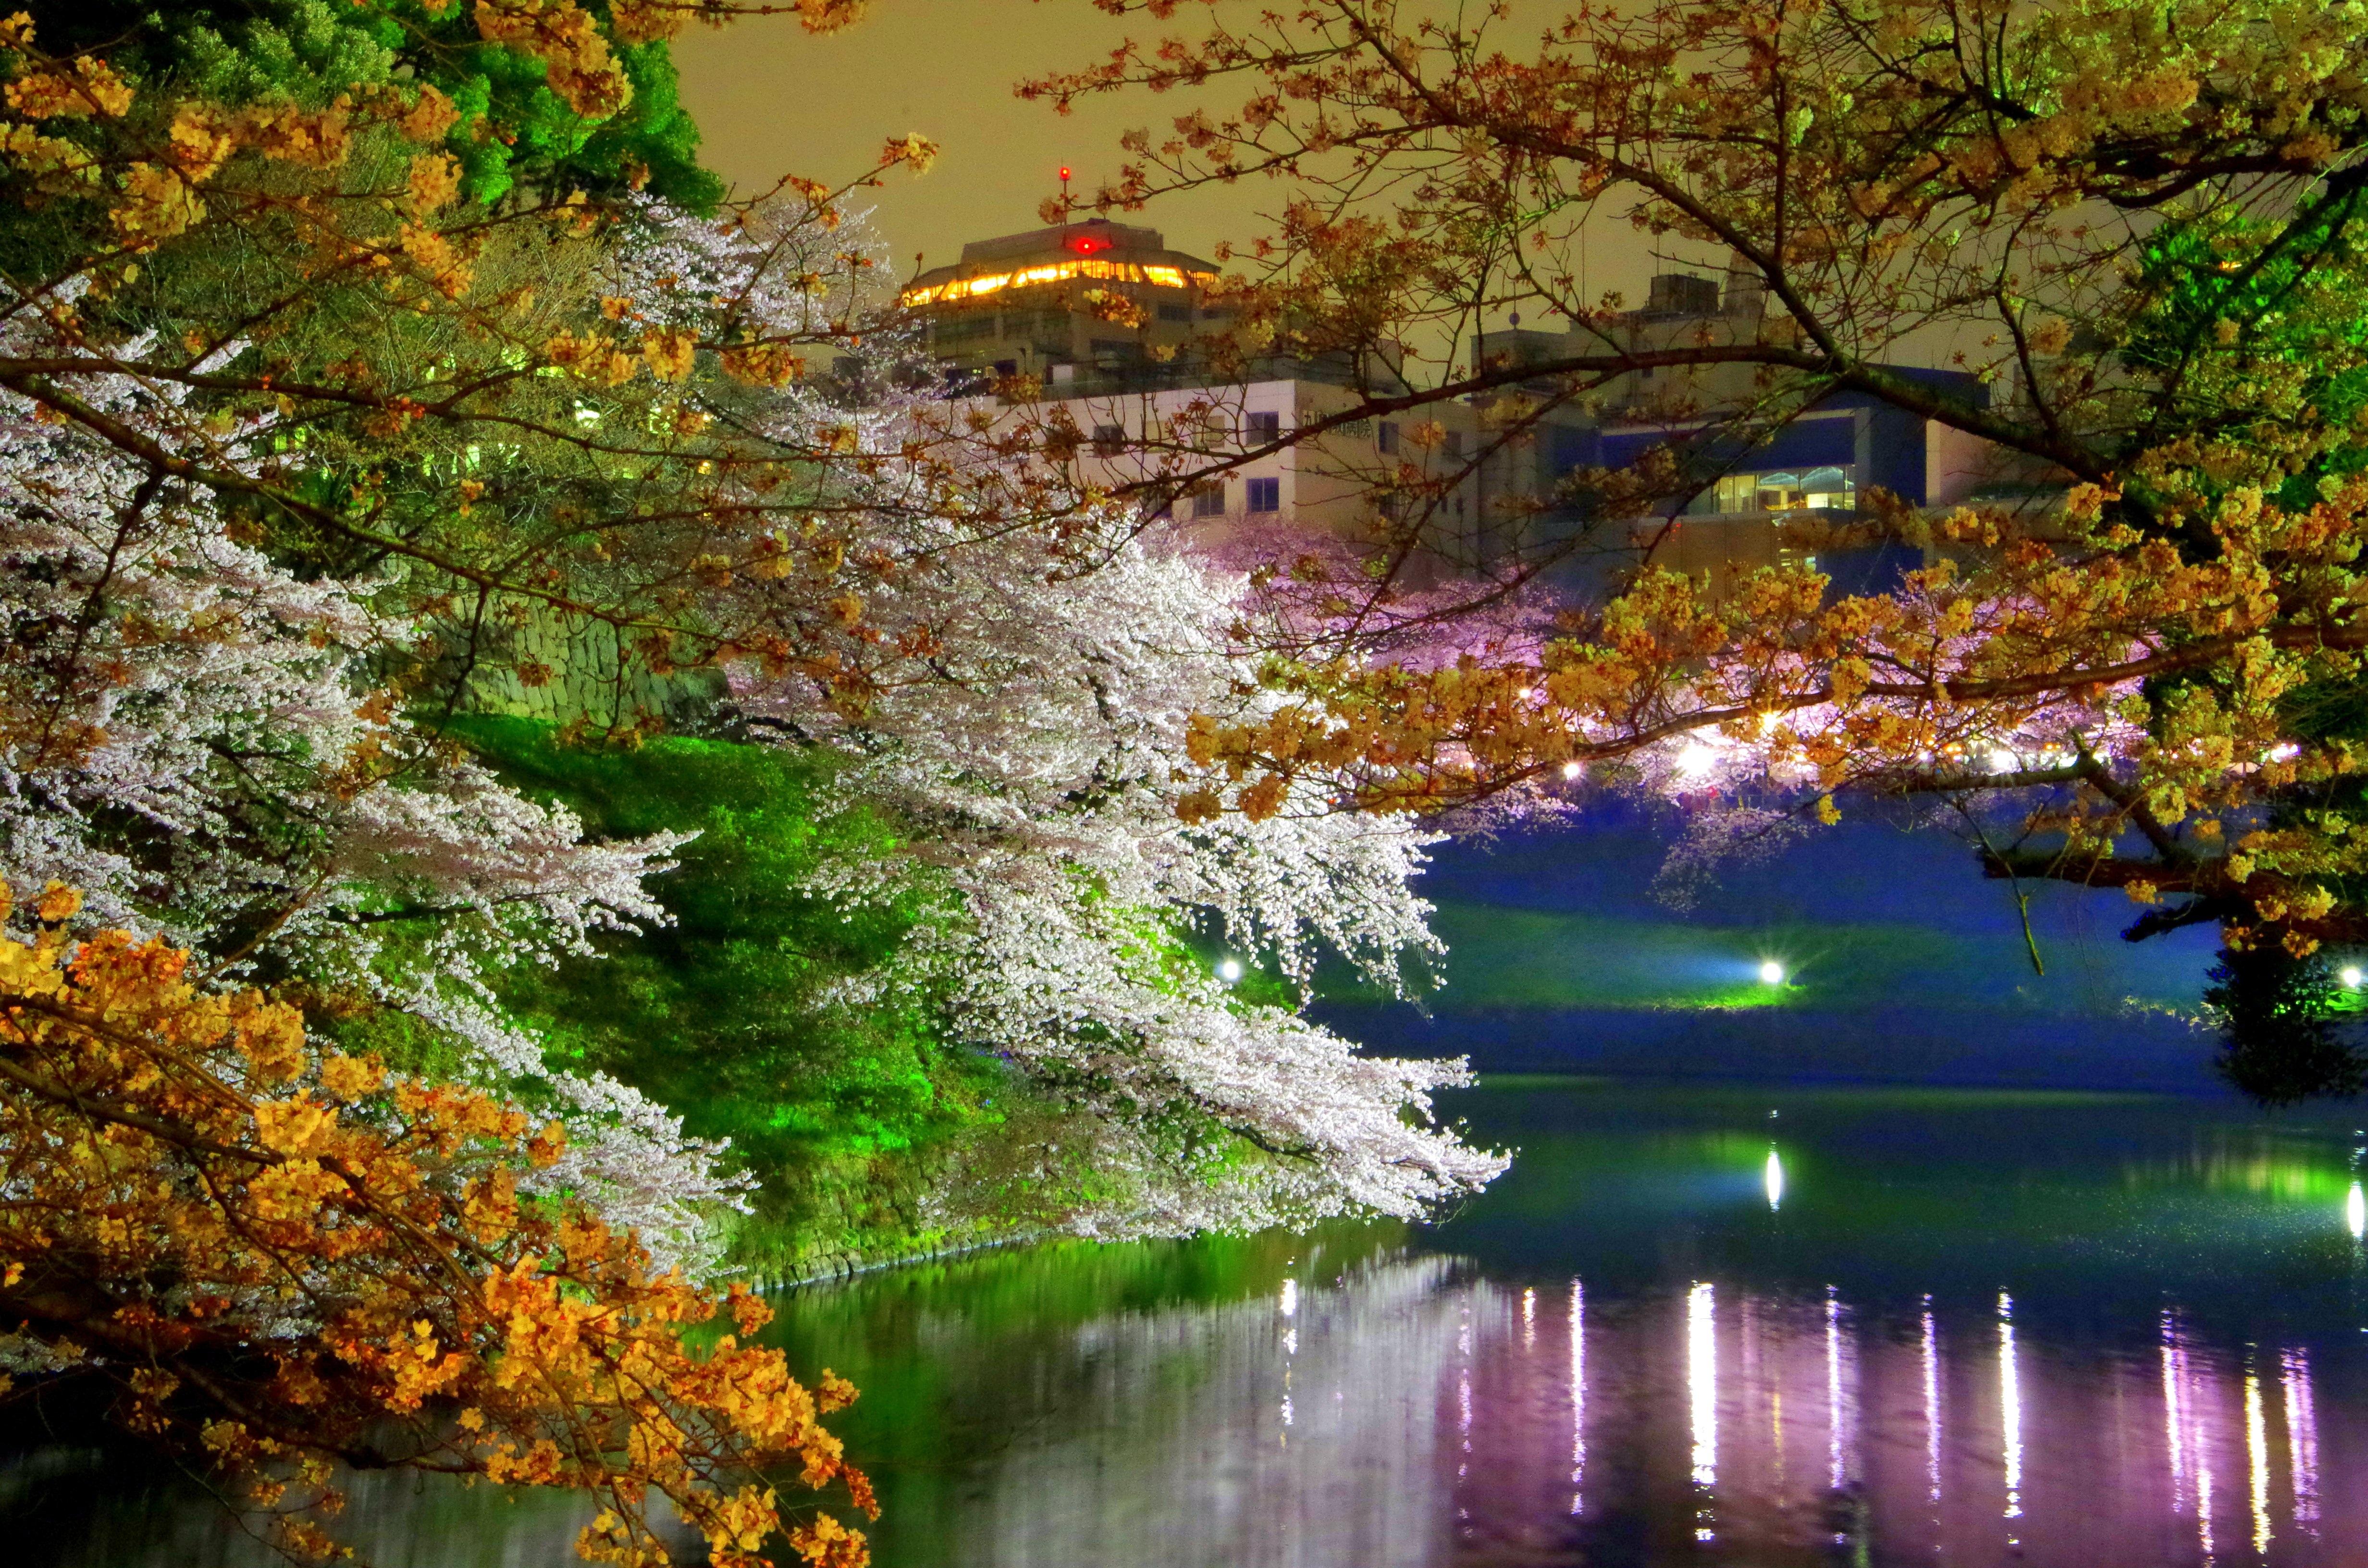 Gambar Pohon Alam Cabang Menanam Sinar Matahari Daun Sungai Kolam Musim Semi Refleksi